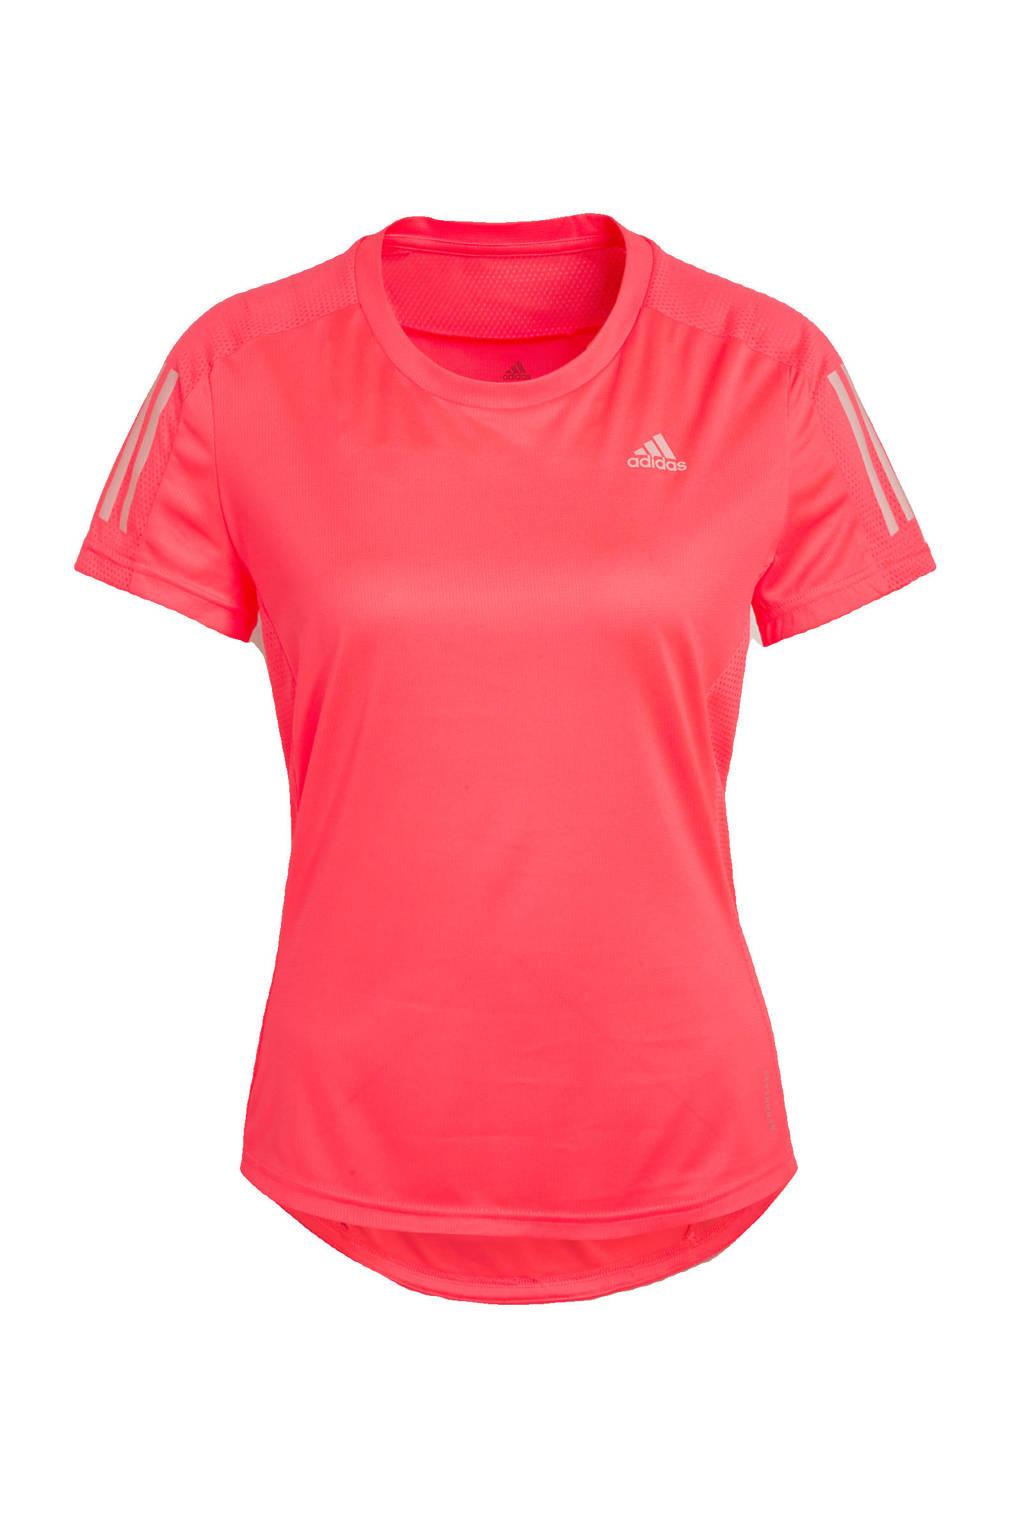 adidas Performance hardloopshirt neon roze, Neon roze, Dames